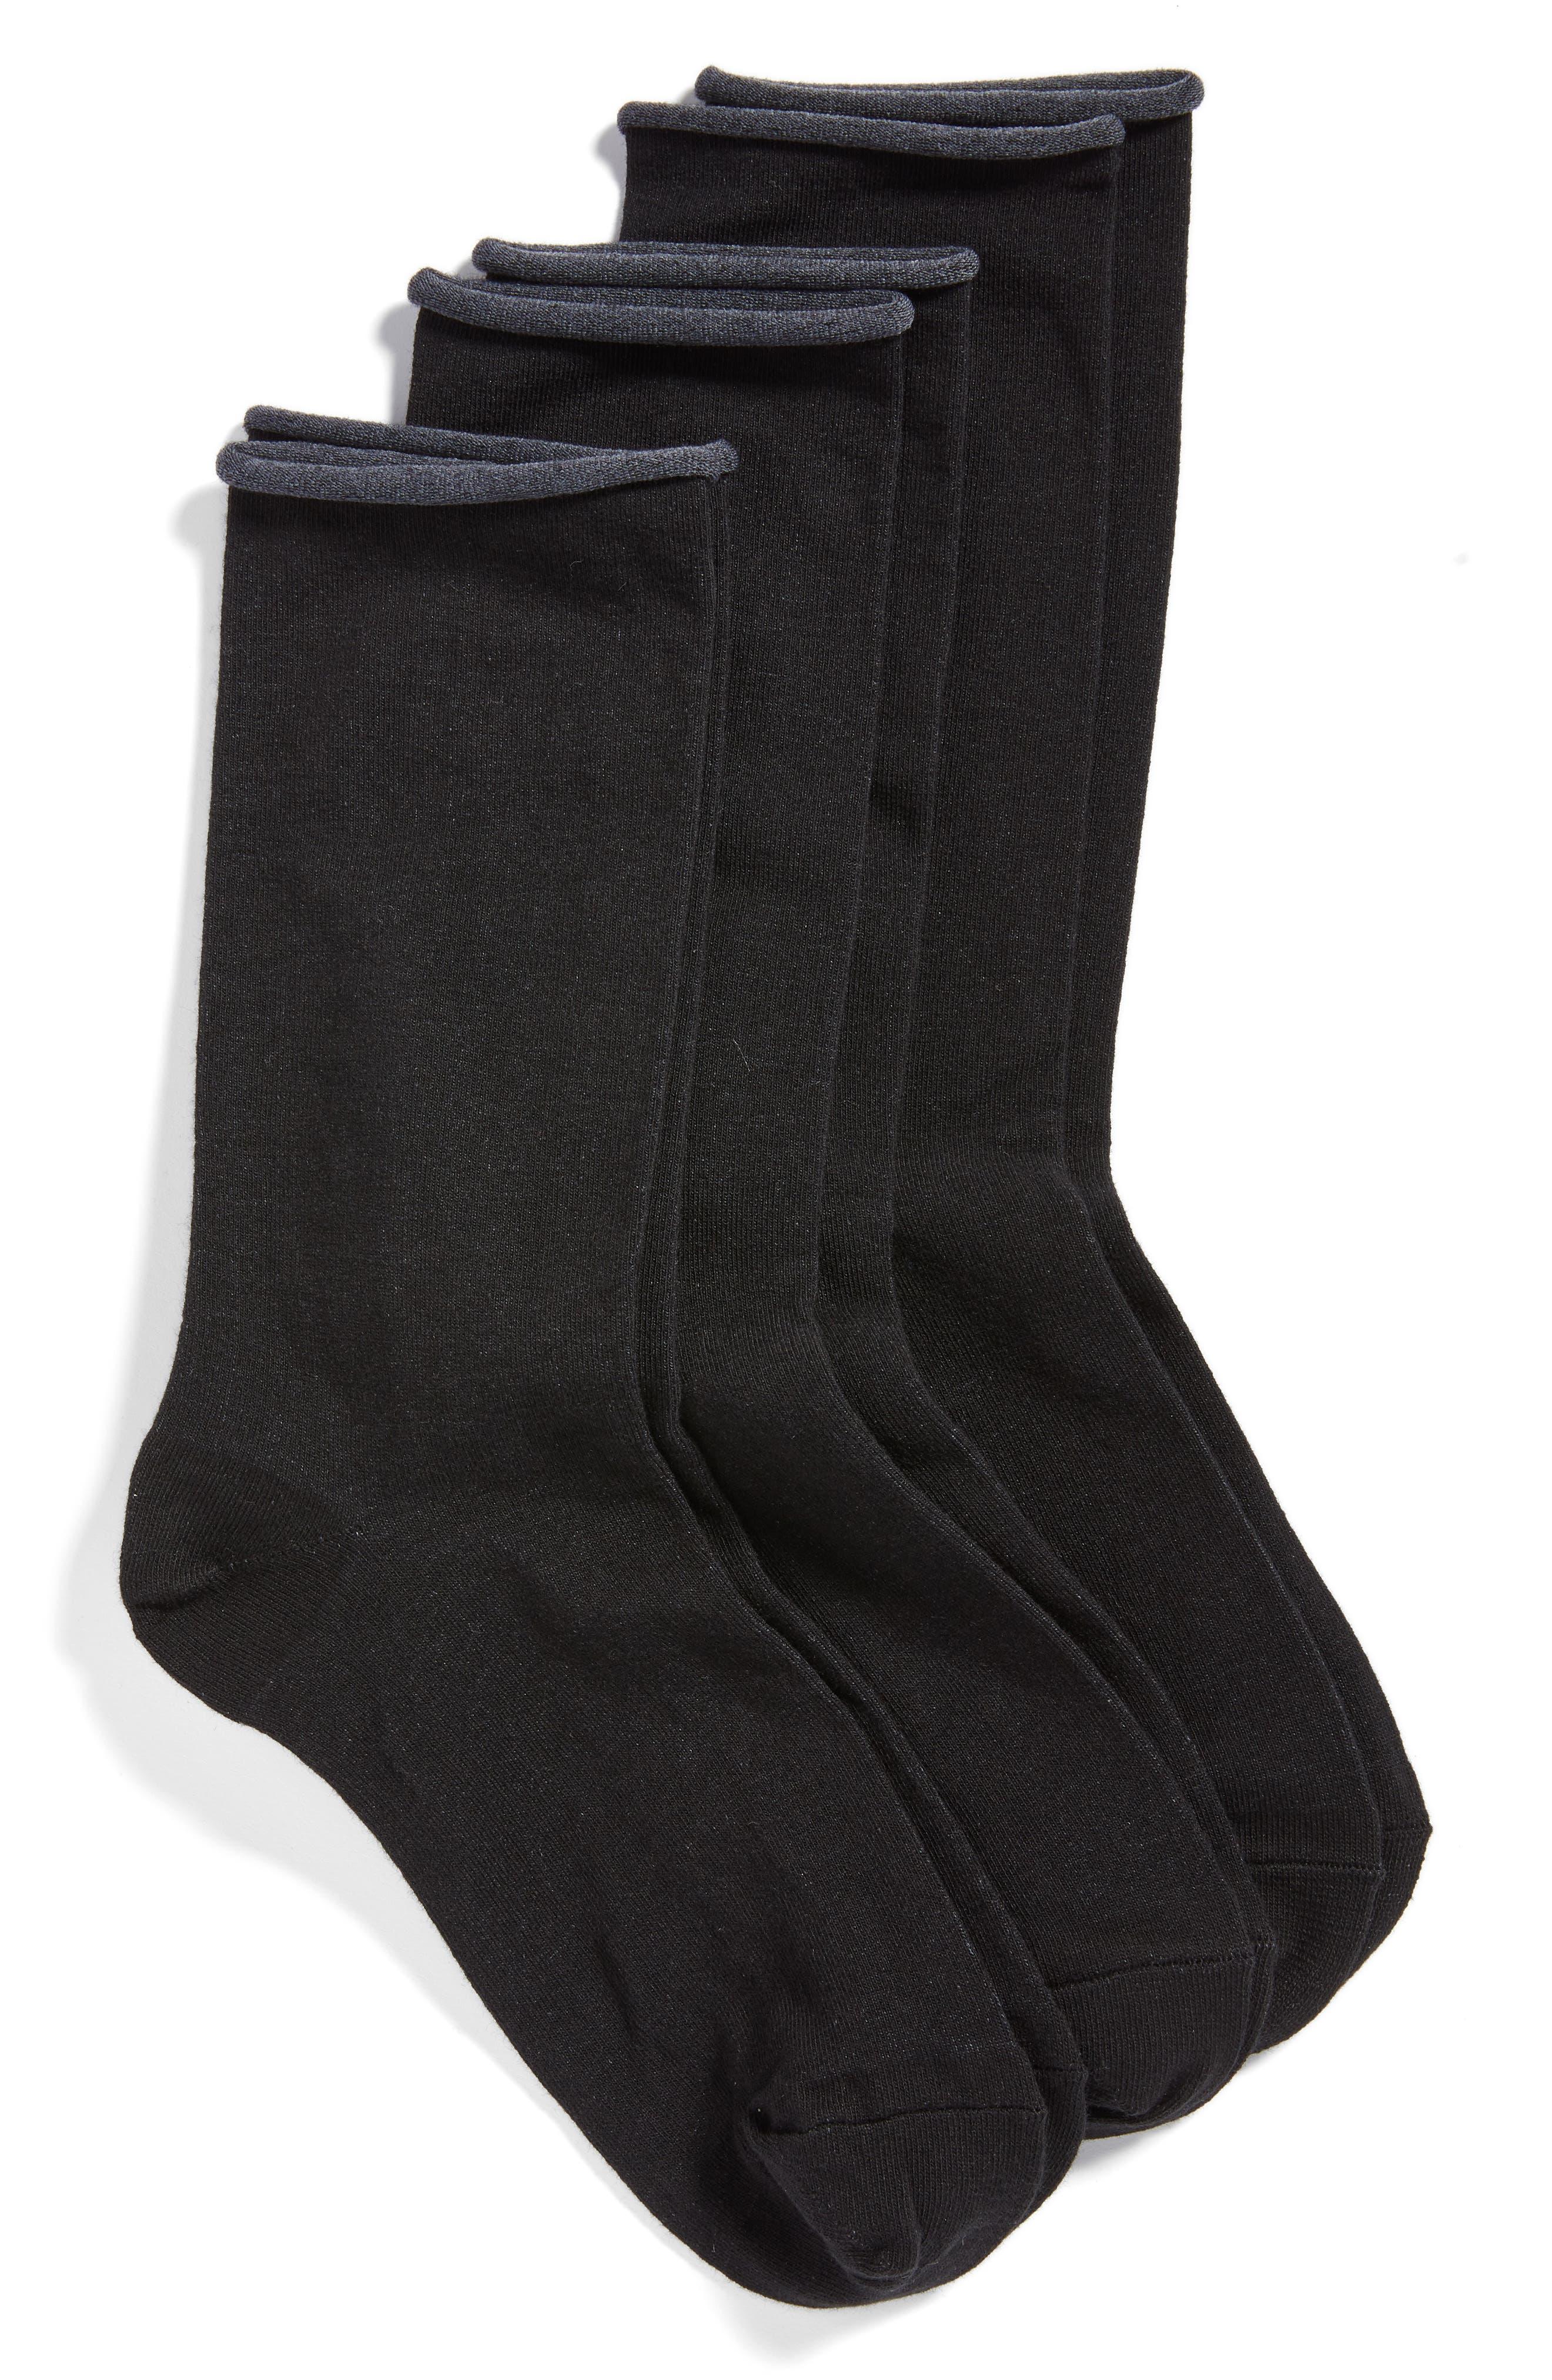 HUE, Jeans 3-Pack Crew Socks, Main thumbnail 1, color, BLACK